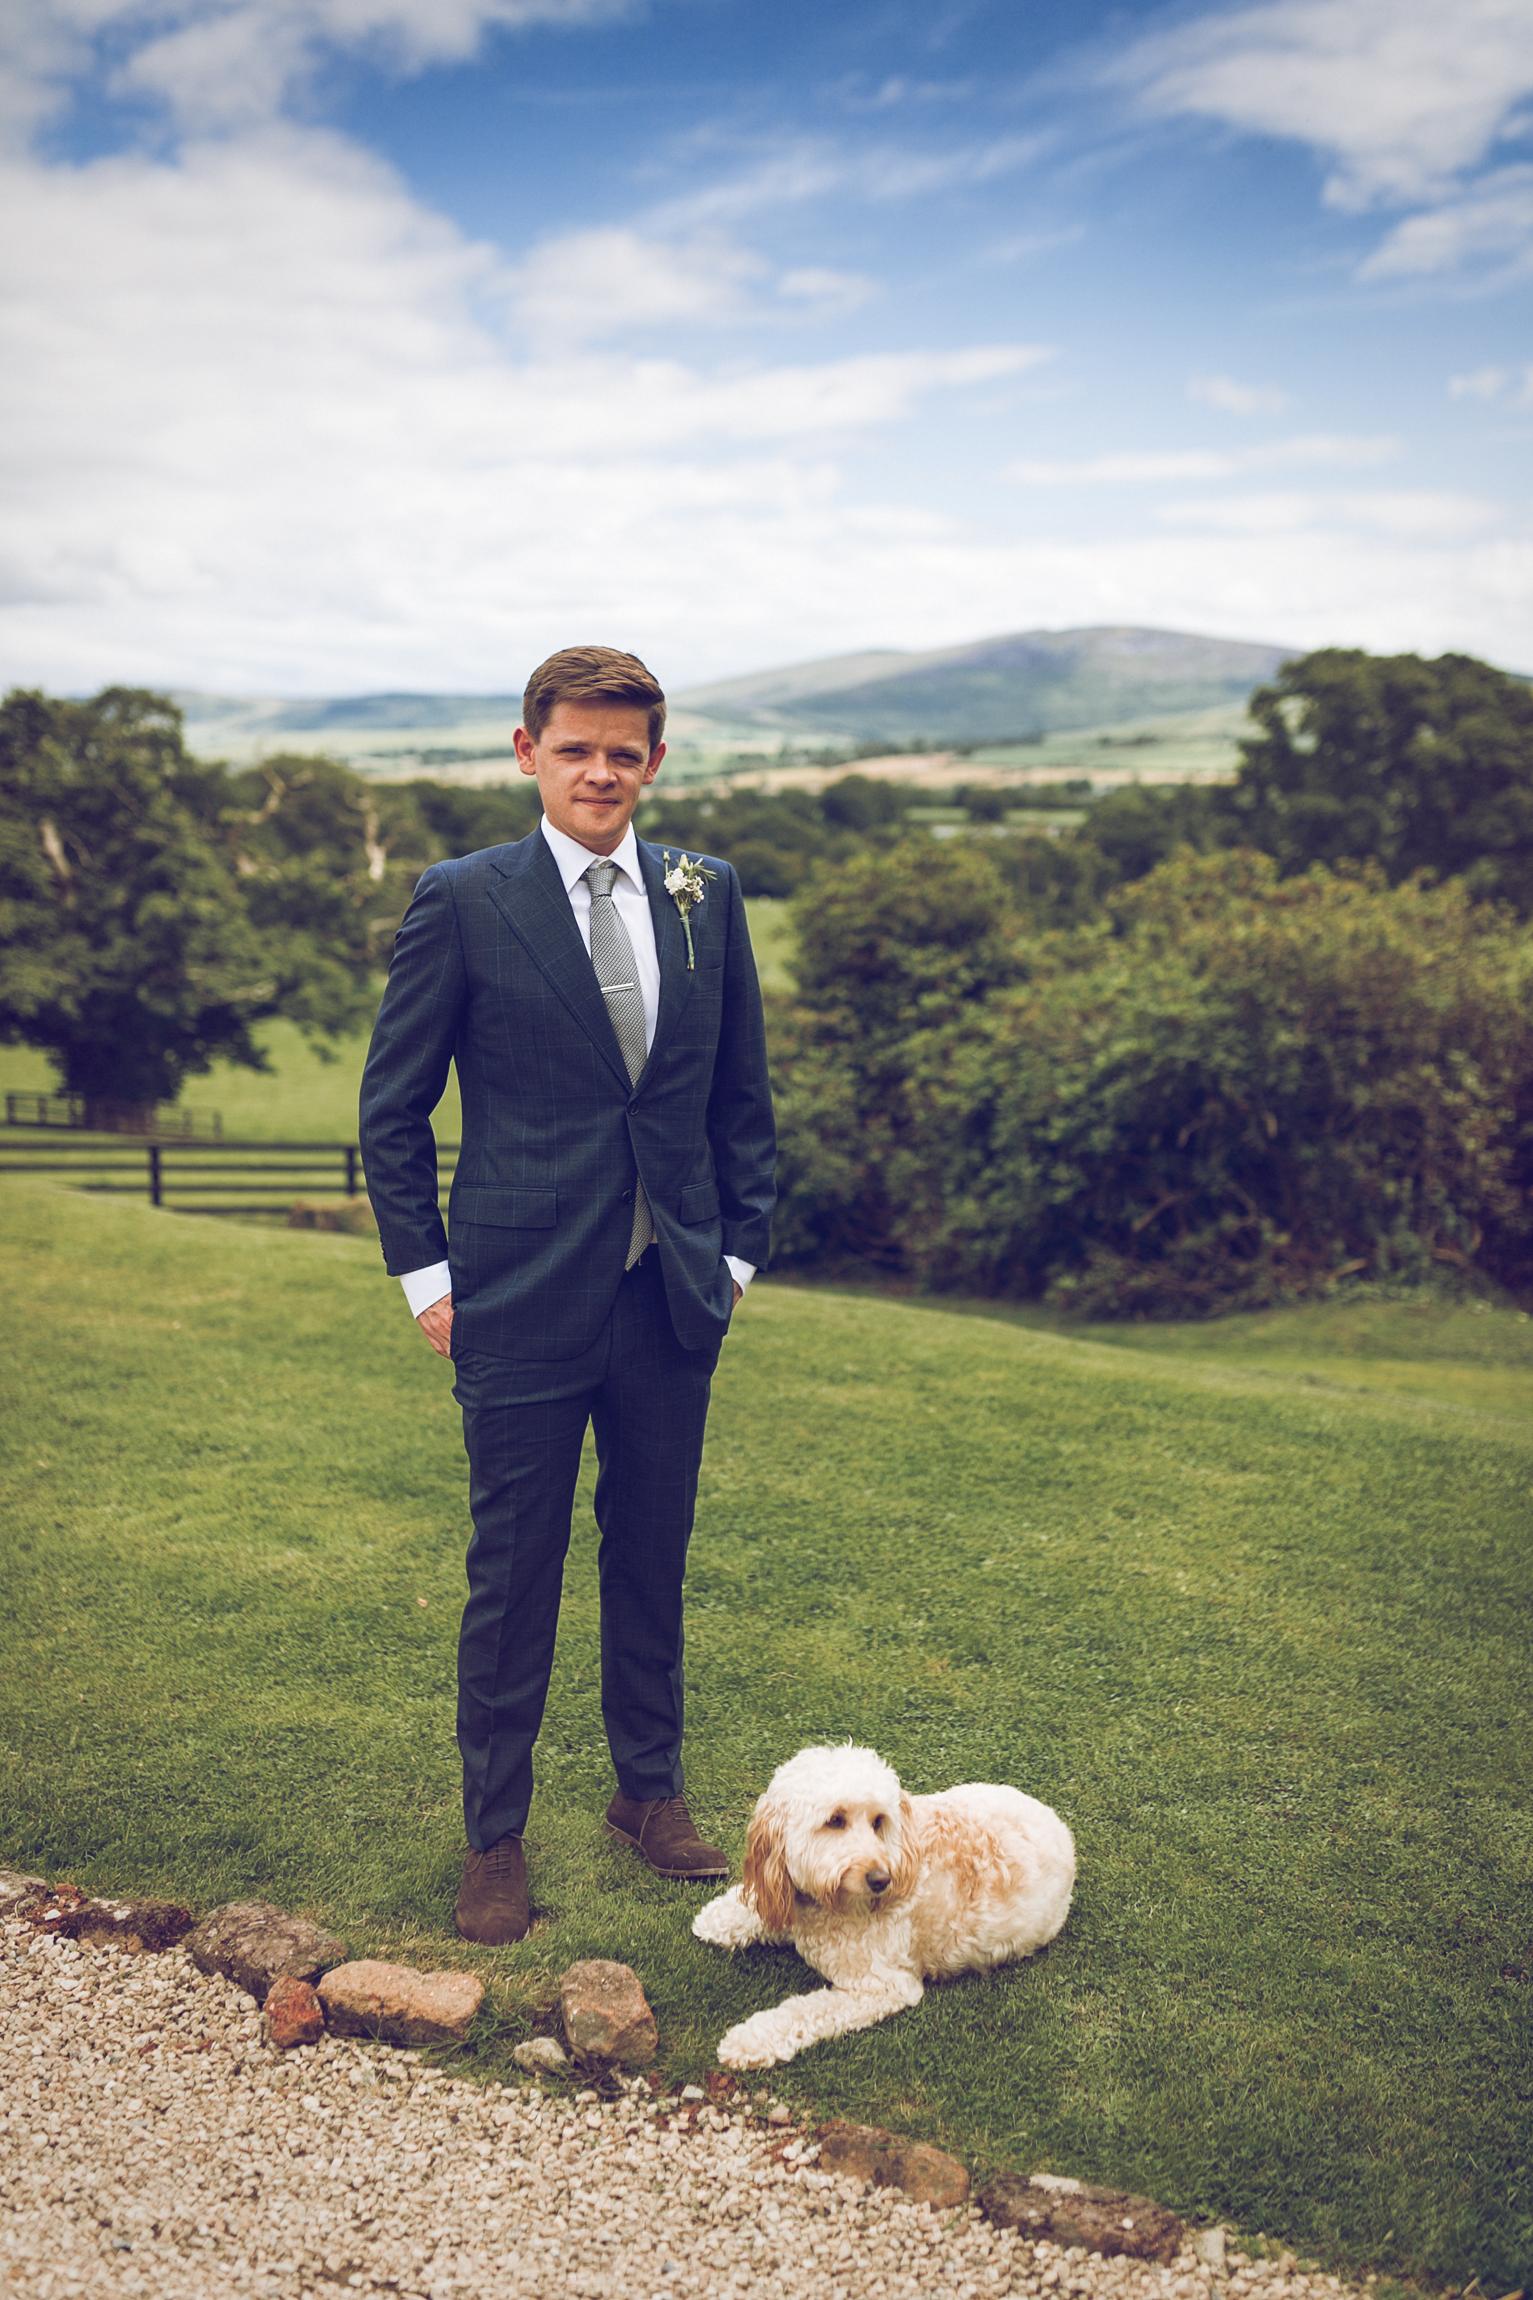 Wedding-photographer-wicklow-south-dublin_Ballybeg_026.jpg